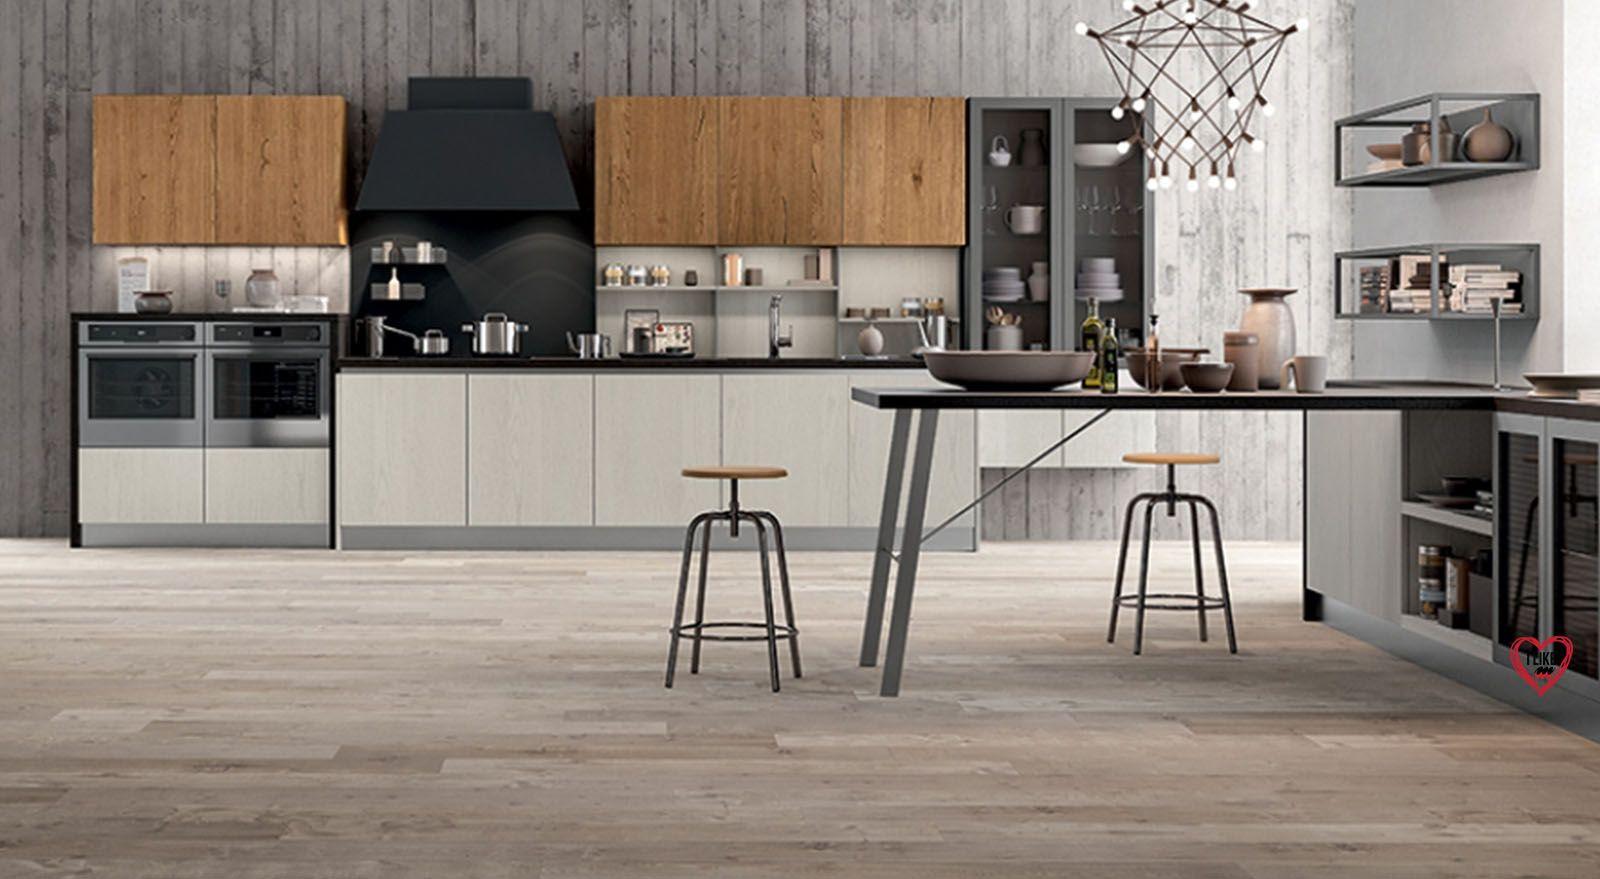 Cucine Componibili Lineari.Cucine Componibili Moderne Lineari Cucine Moderne Cucine